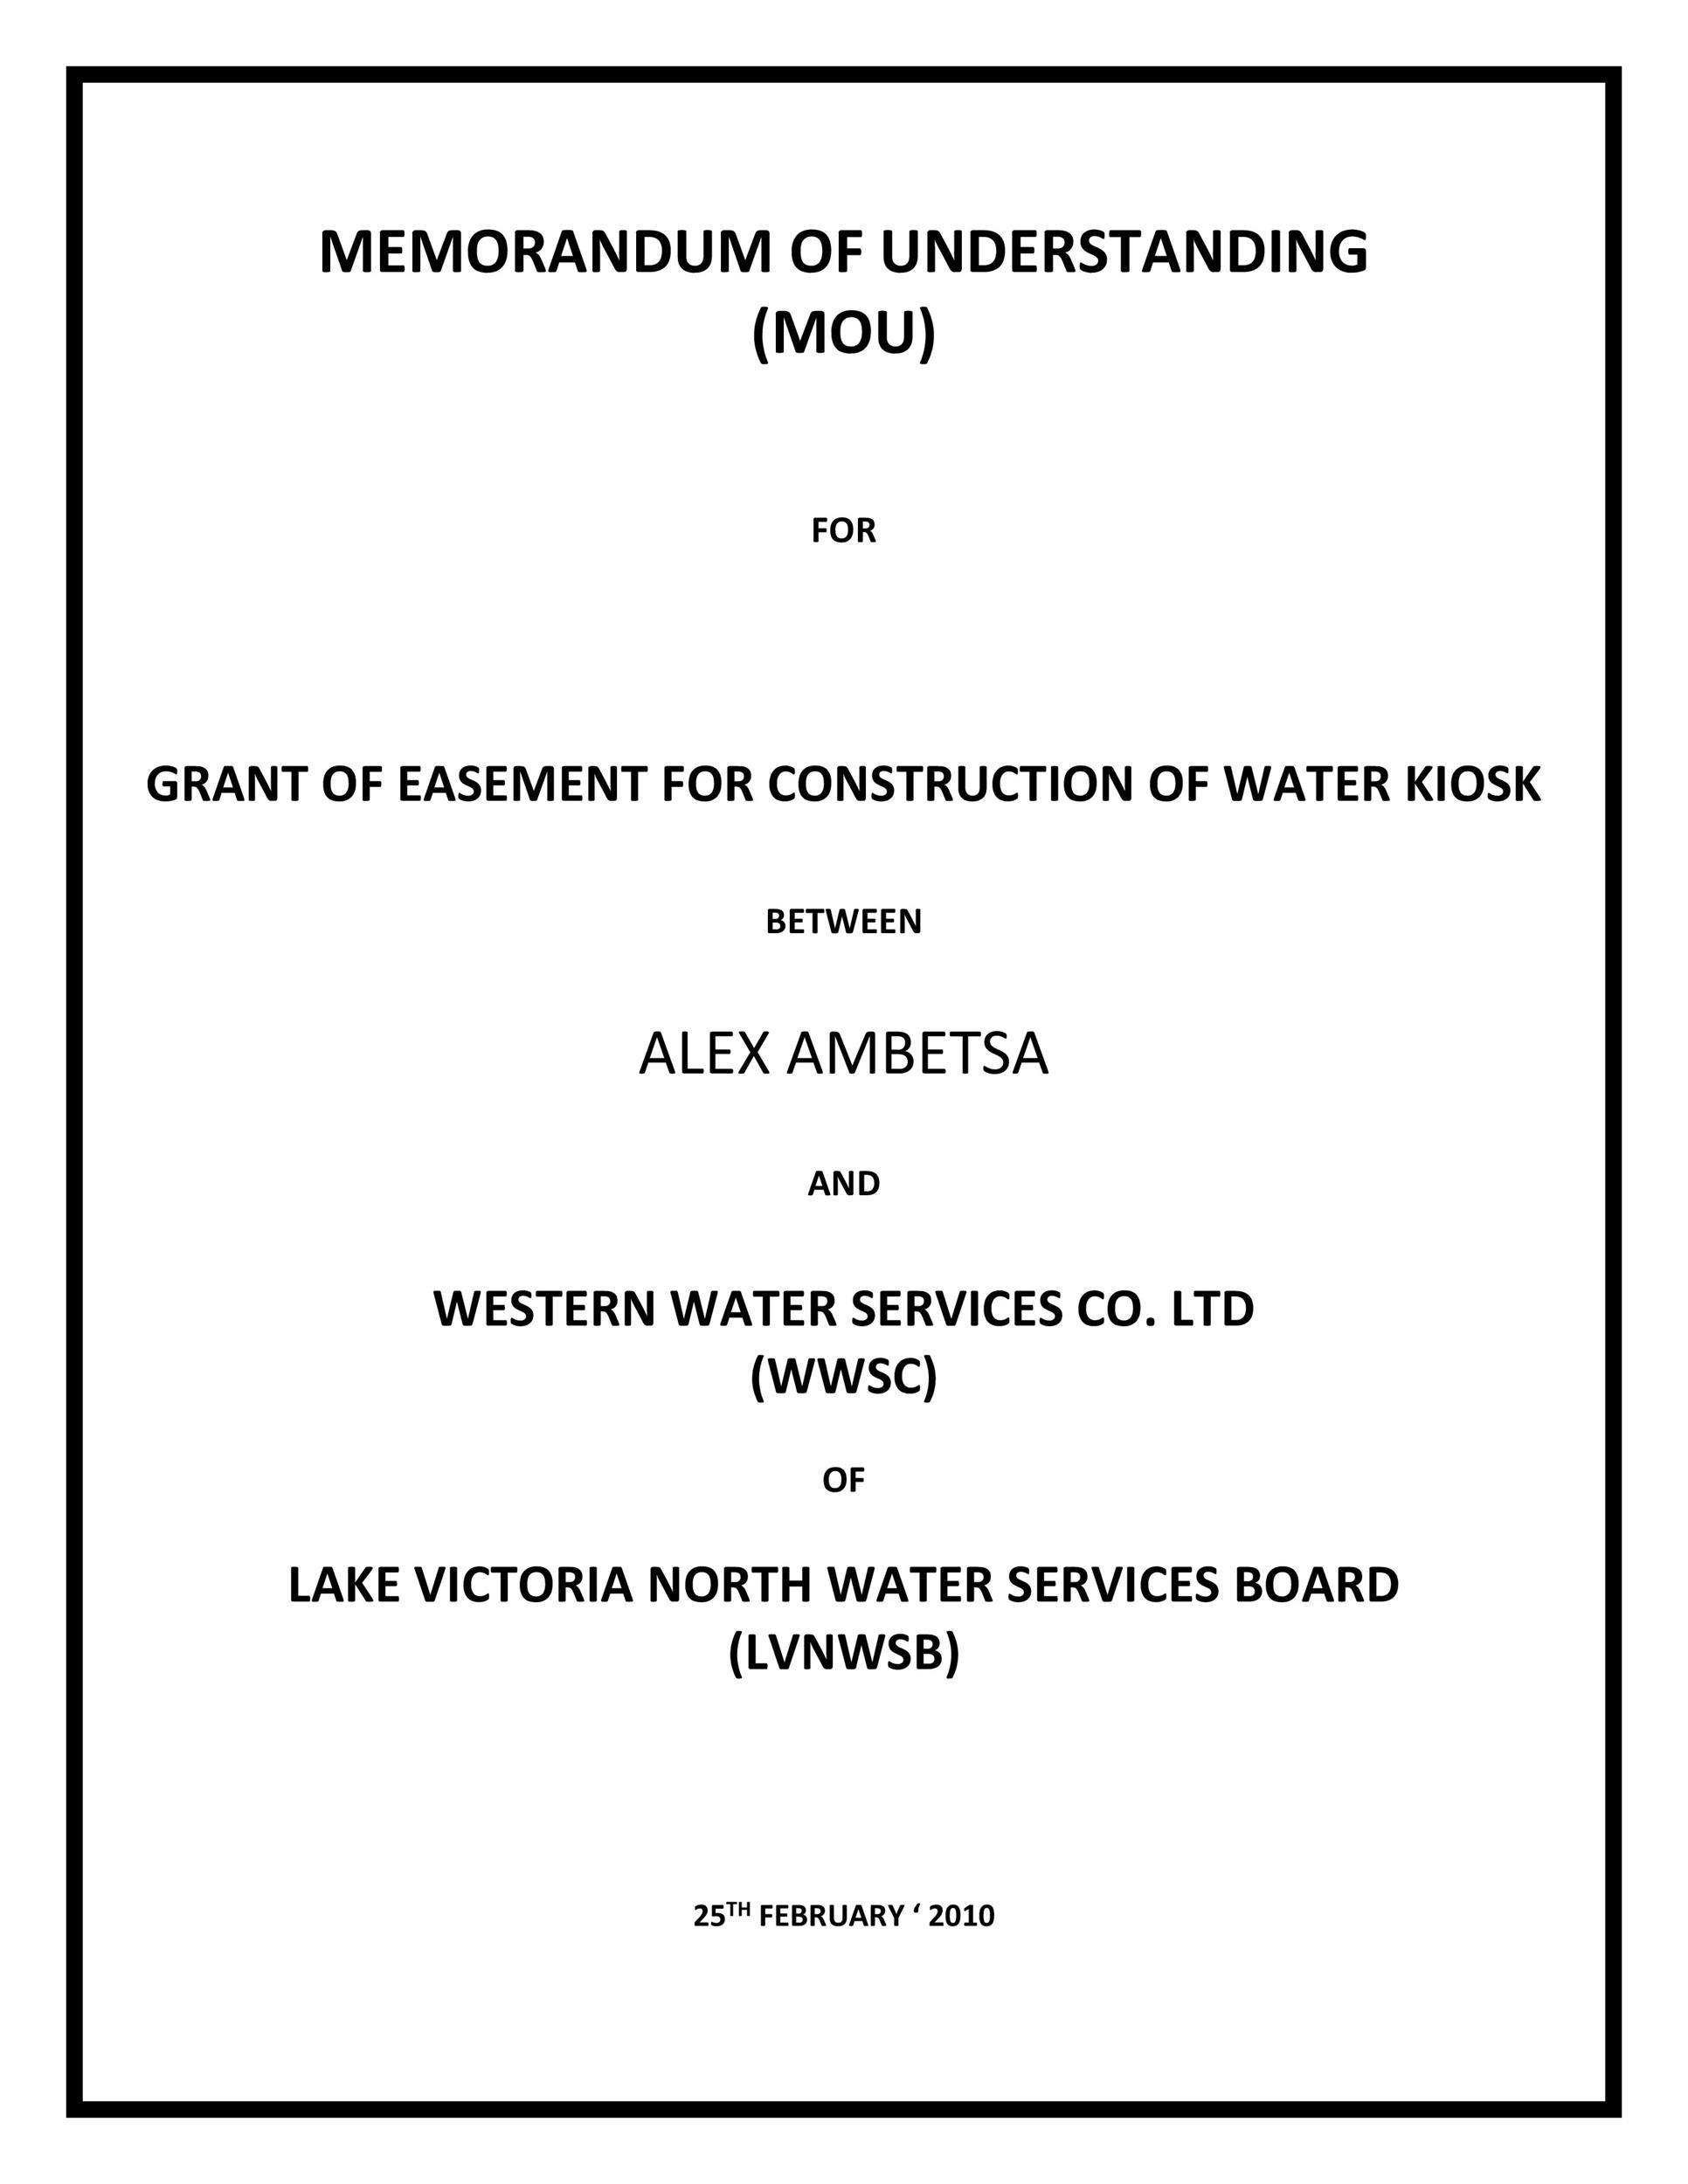 Free Memorandum of Understanding Template 08